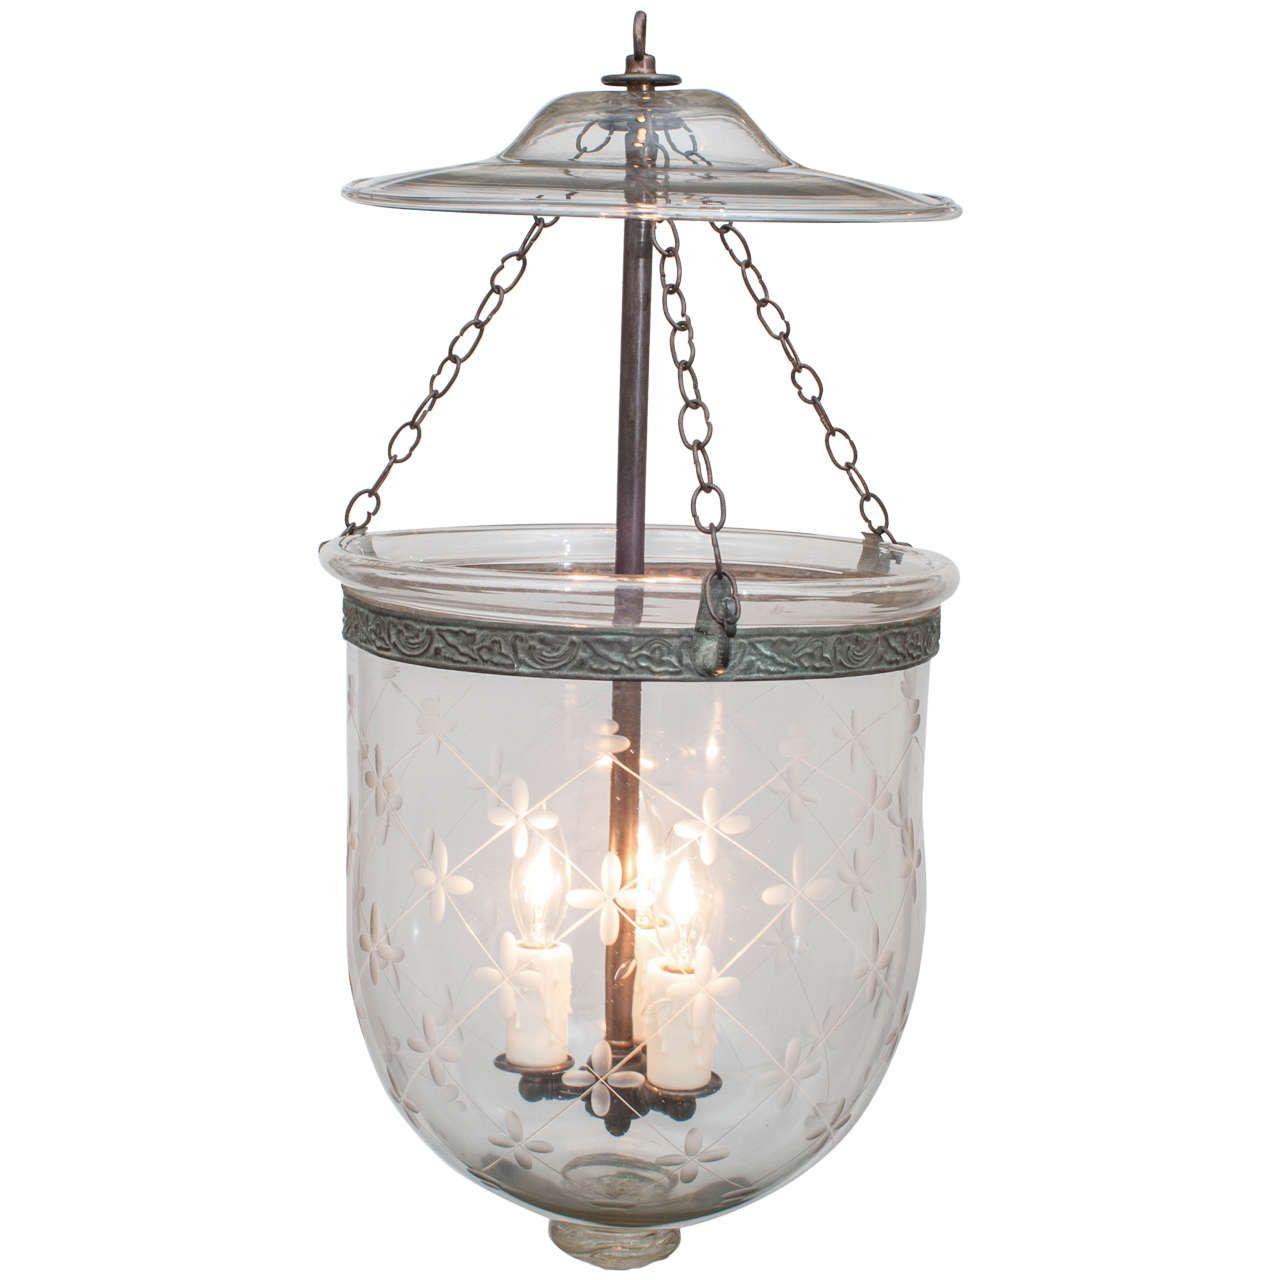 bell jar lighting fixtures. Star Grid Bell Jar Lantern, England, Circa 1810 Lighting Fixtures